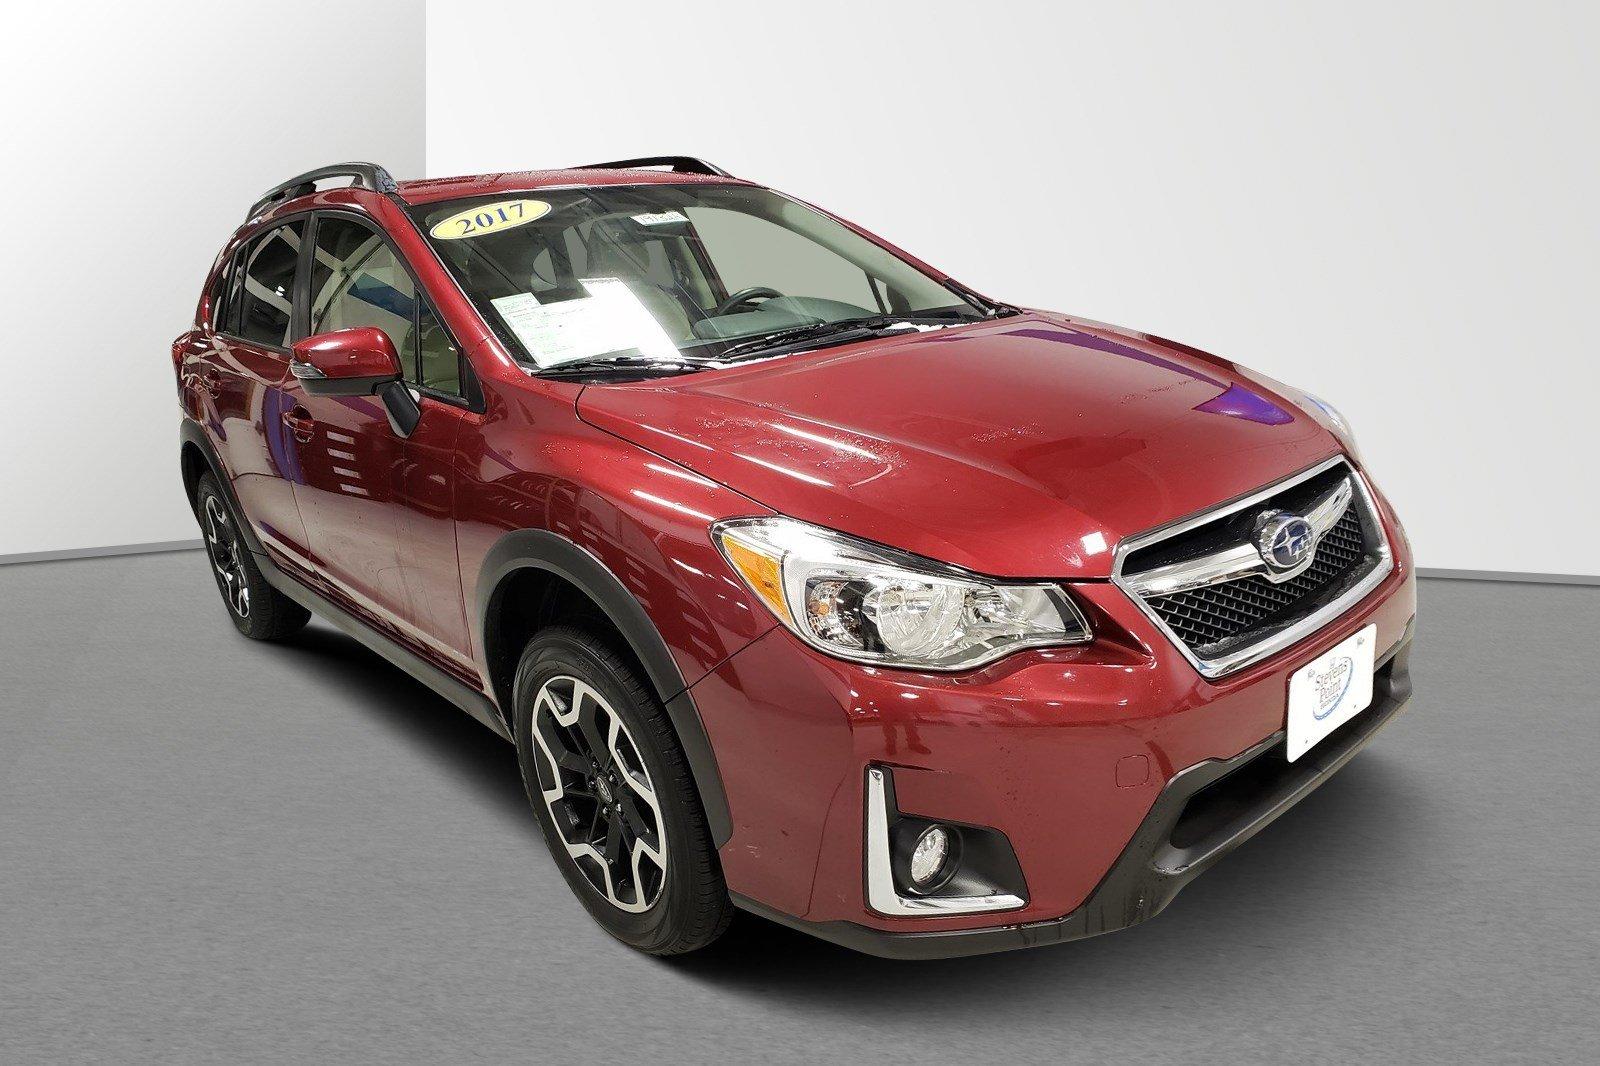 2017 Subaru Crosstrek Limited 2.0i Limited CVT